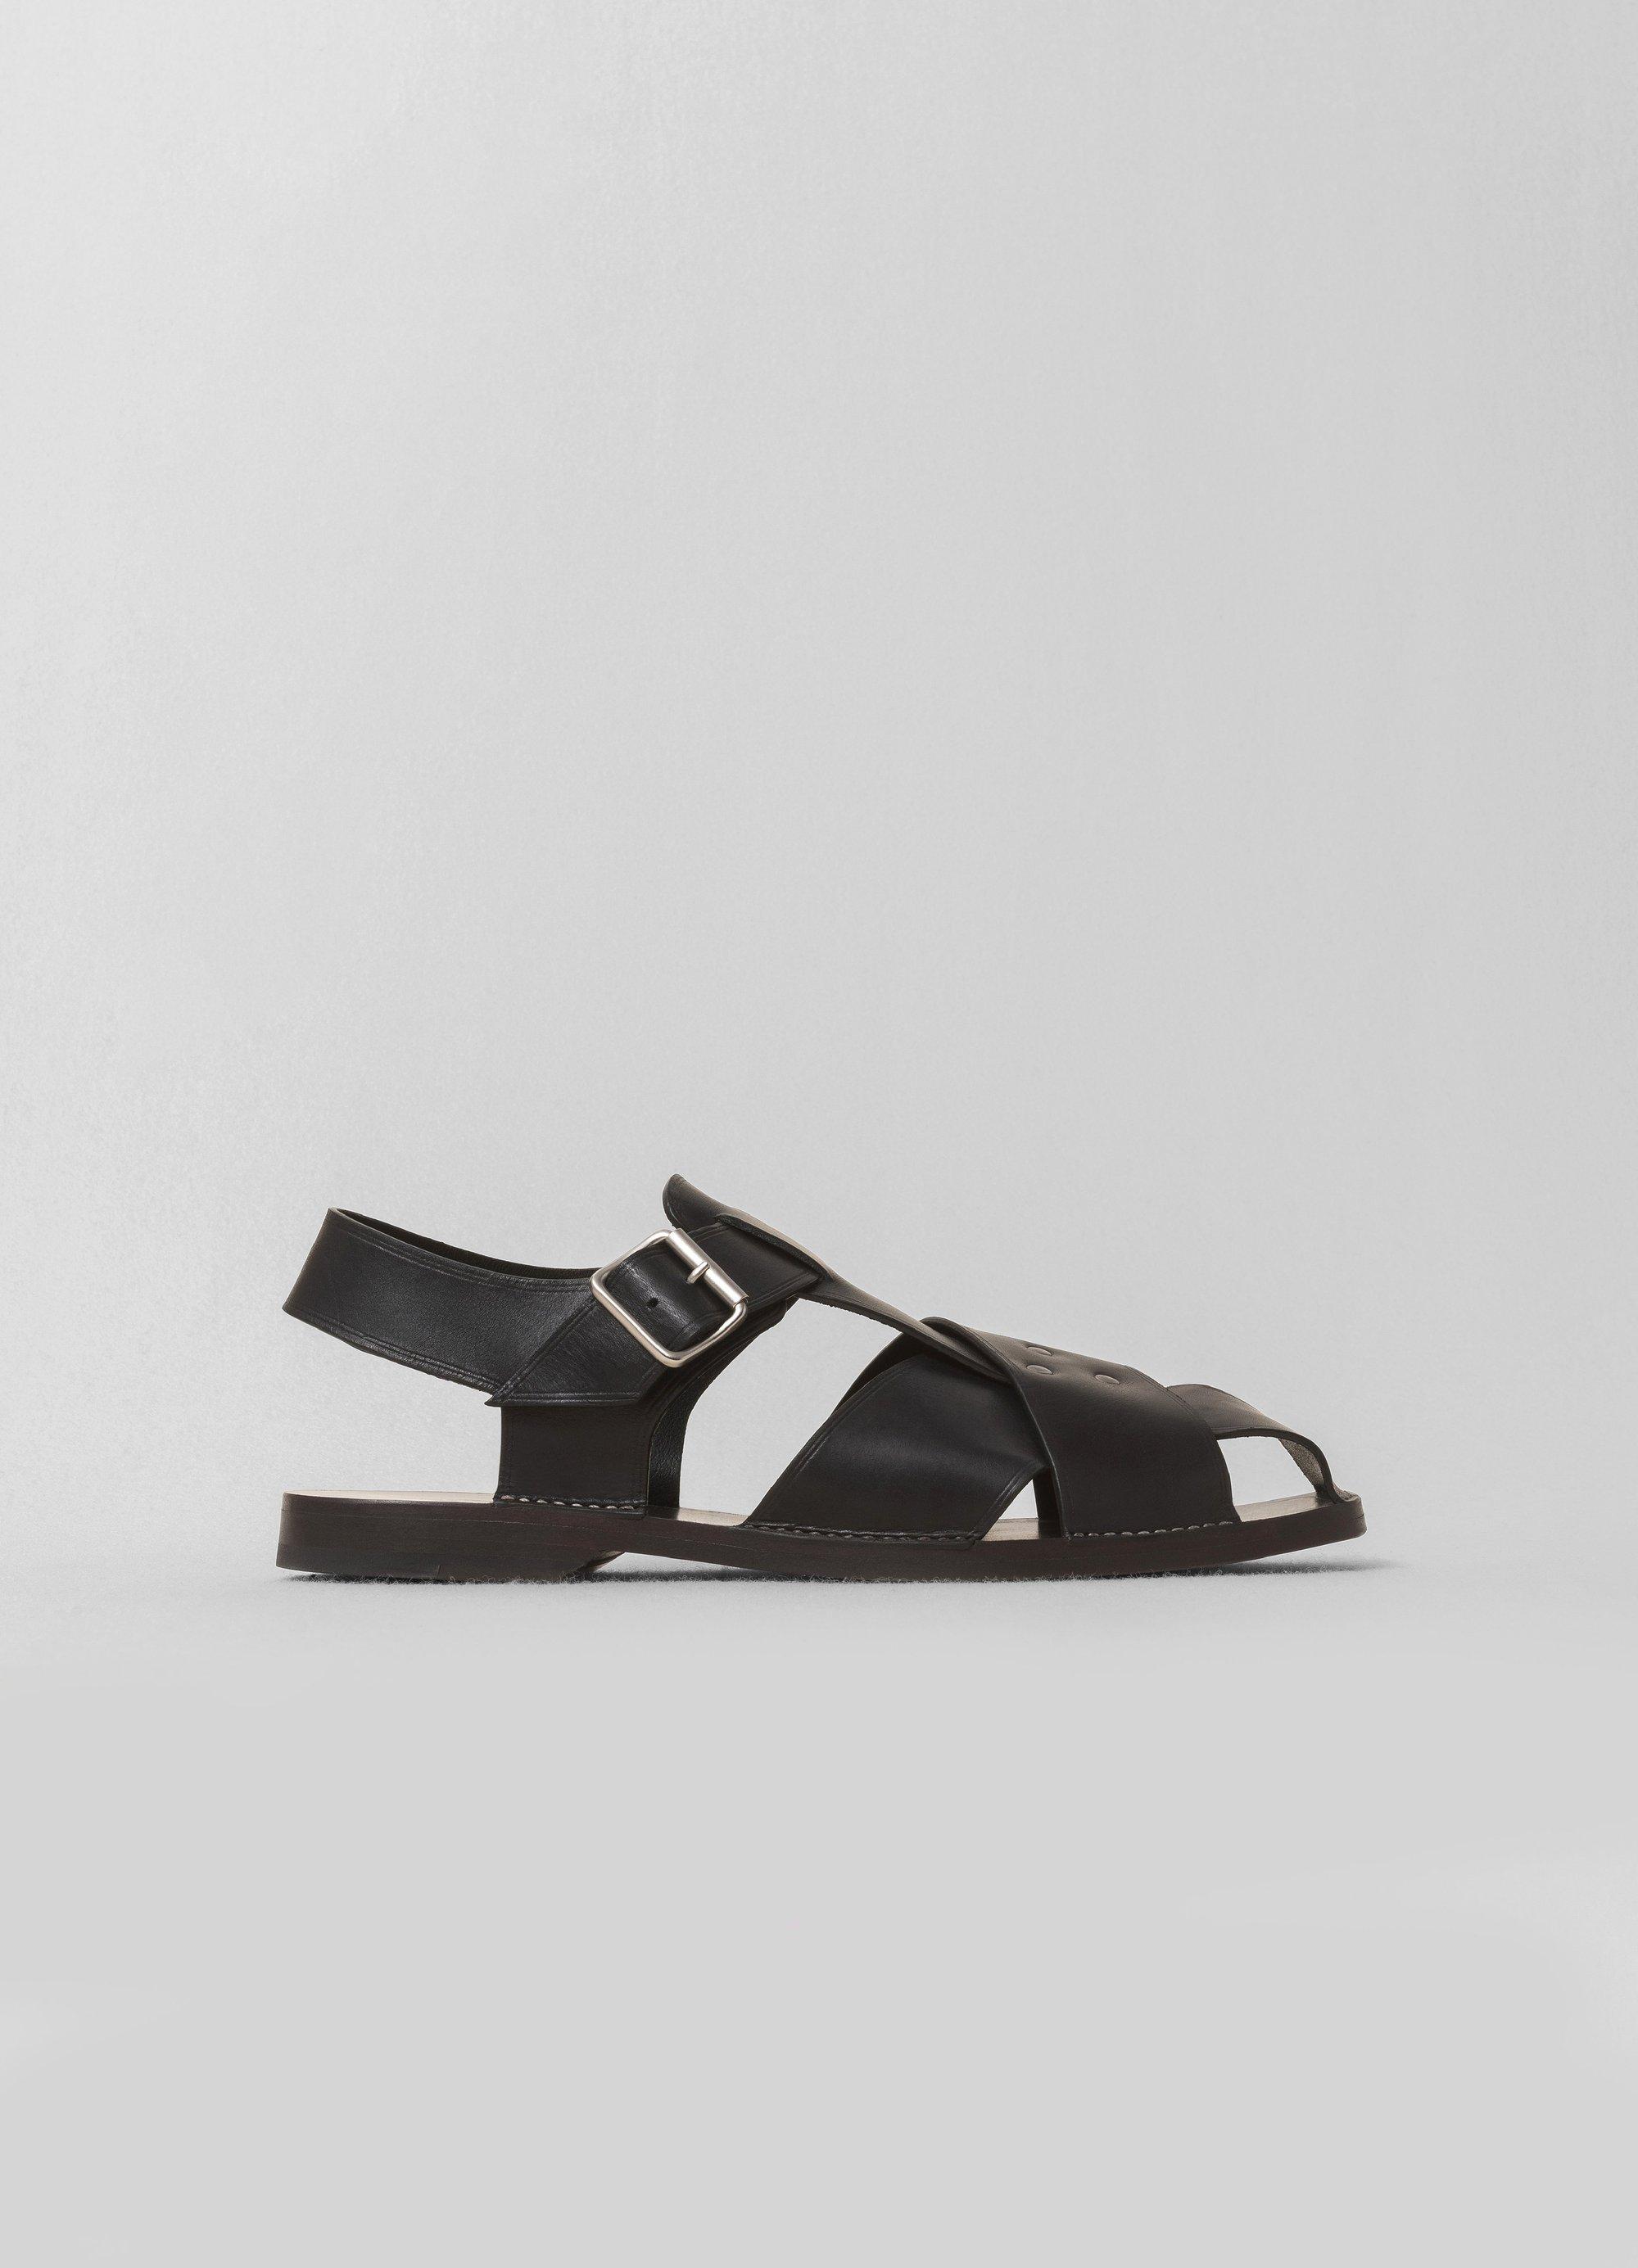 Lemaire sandali con cinturino uomo LEMAIRE   Sandali   211 FO296 LL168999